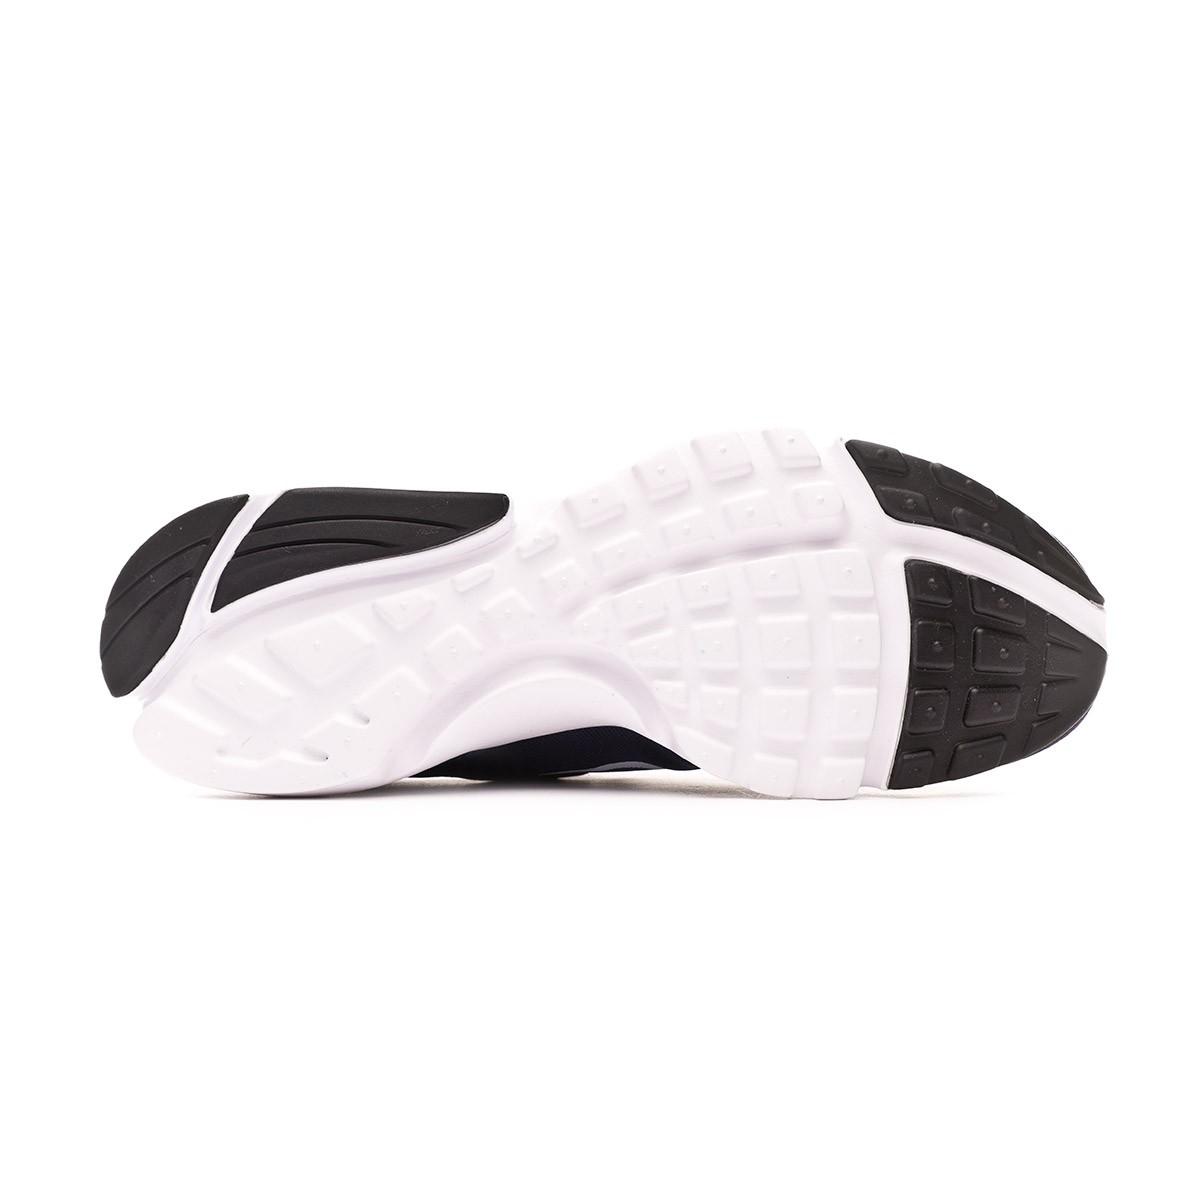 2a435de8c8a11 Trainers Nike Presto Fly World 2019 Mifnight navy-White-Black - Tienda de  fútbol Fútbol Emotion